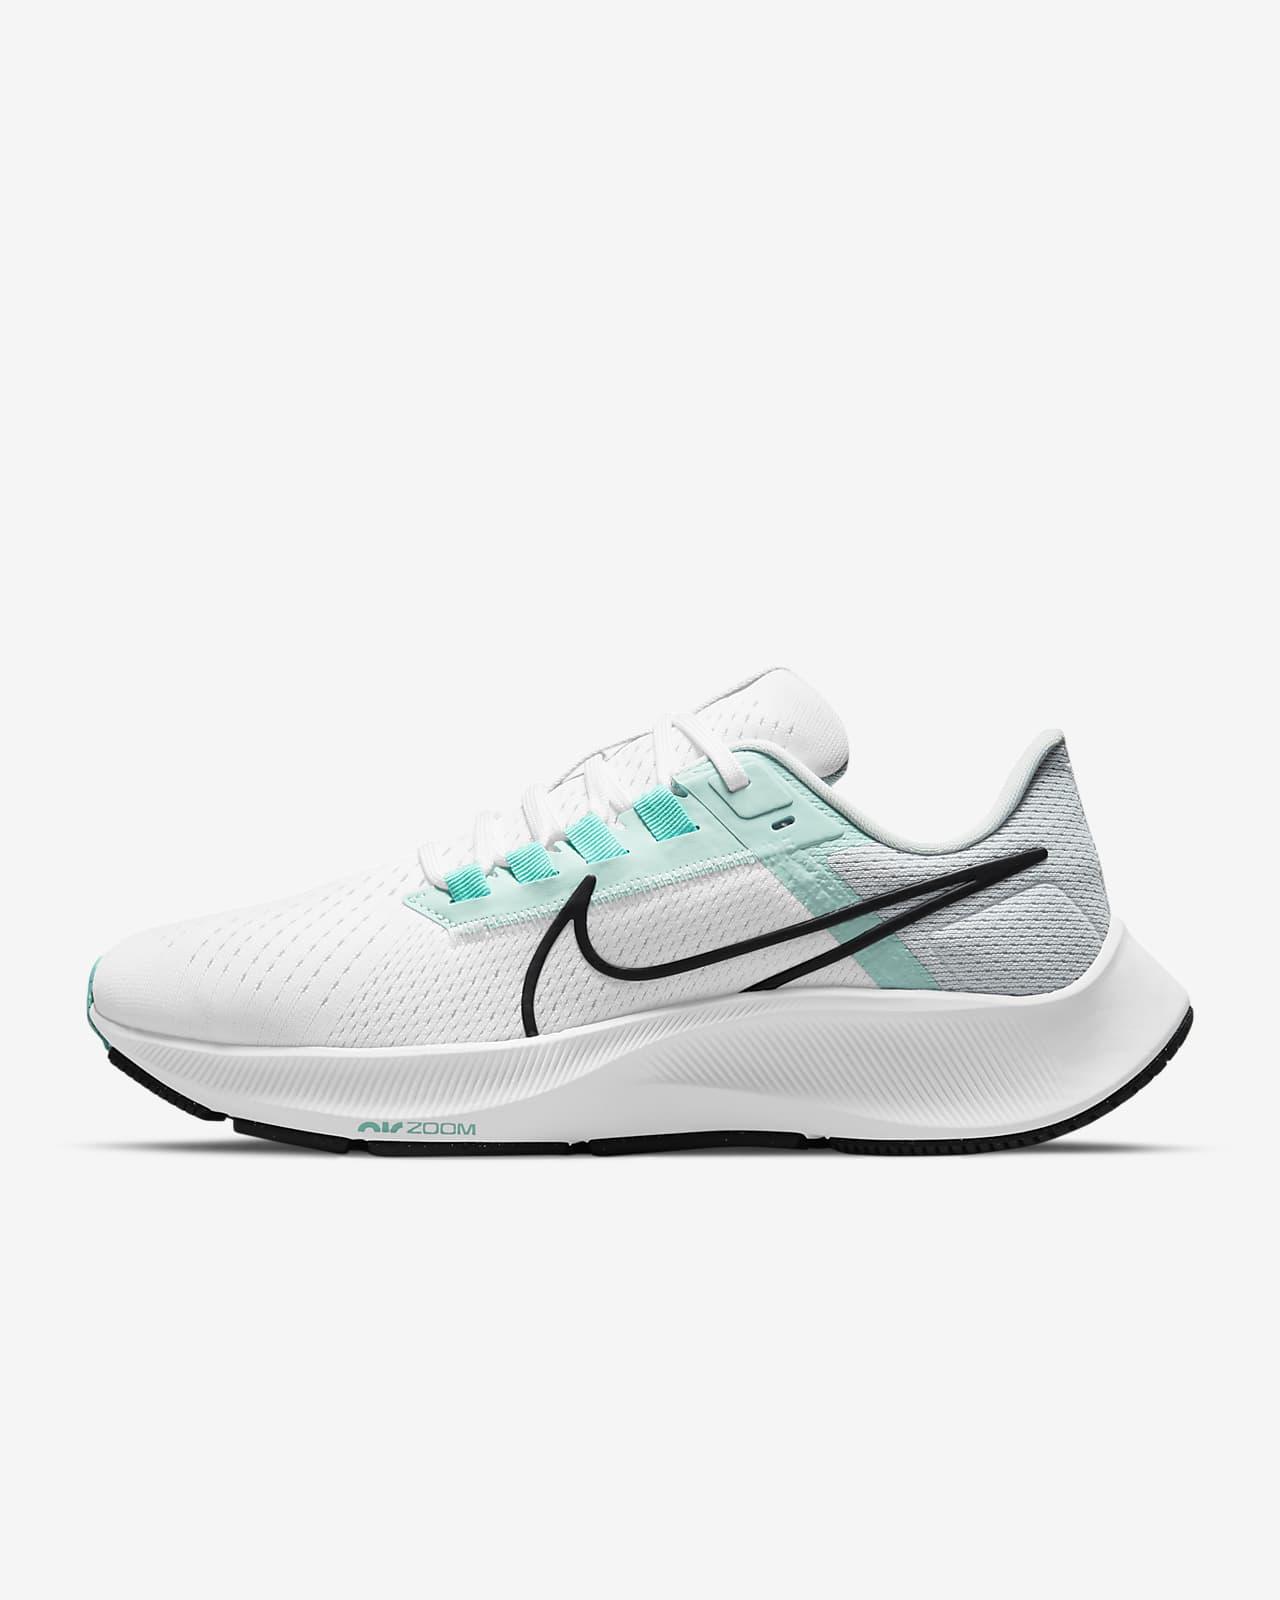 Chaussure de running Nike Air Zoom Pegasus 38 pour Femme. Nike LU